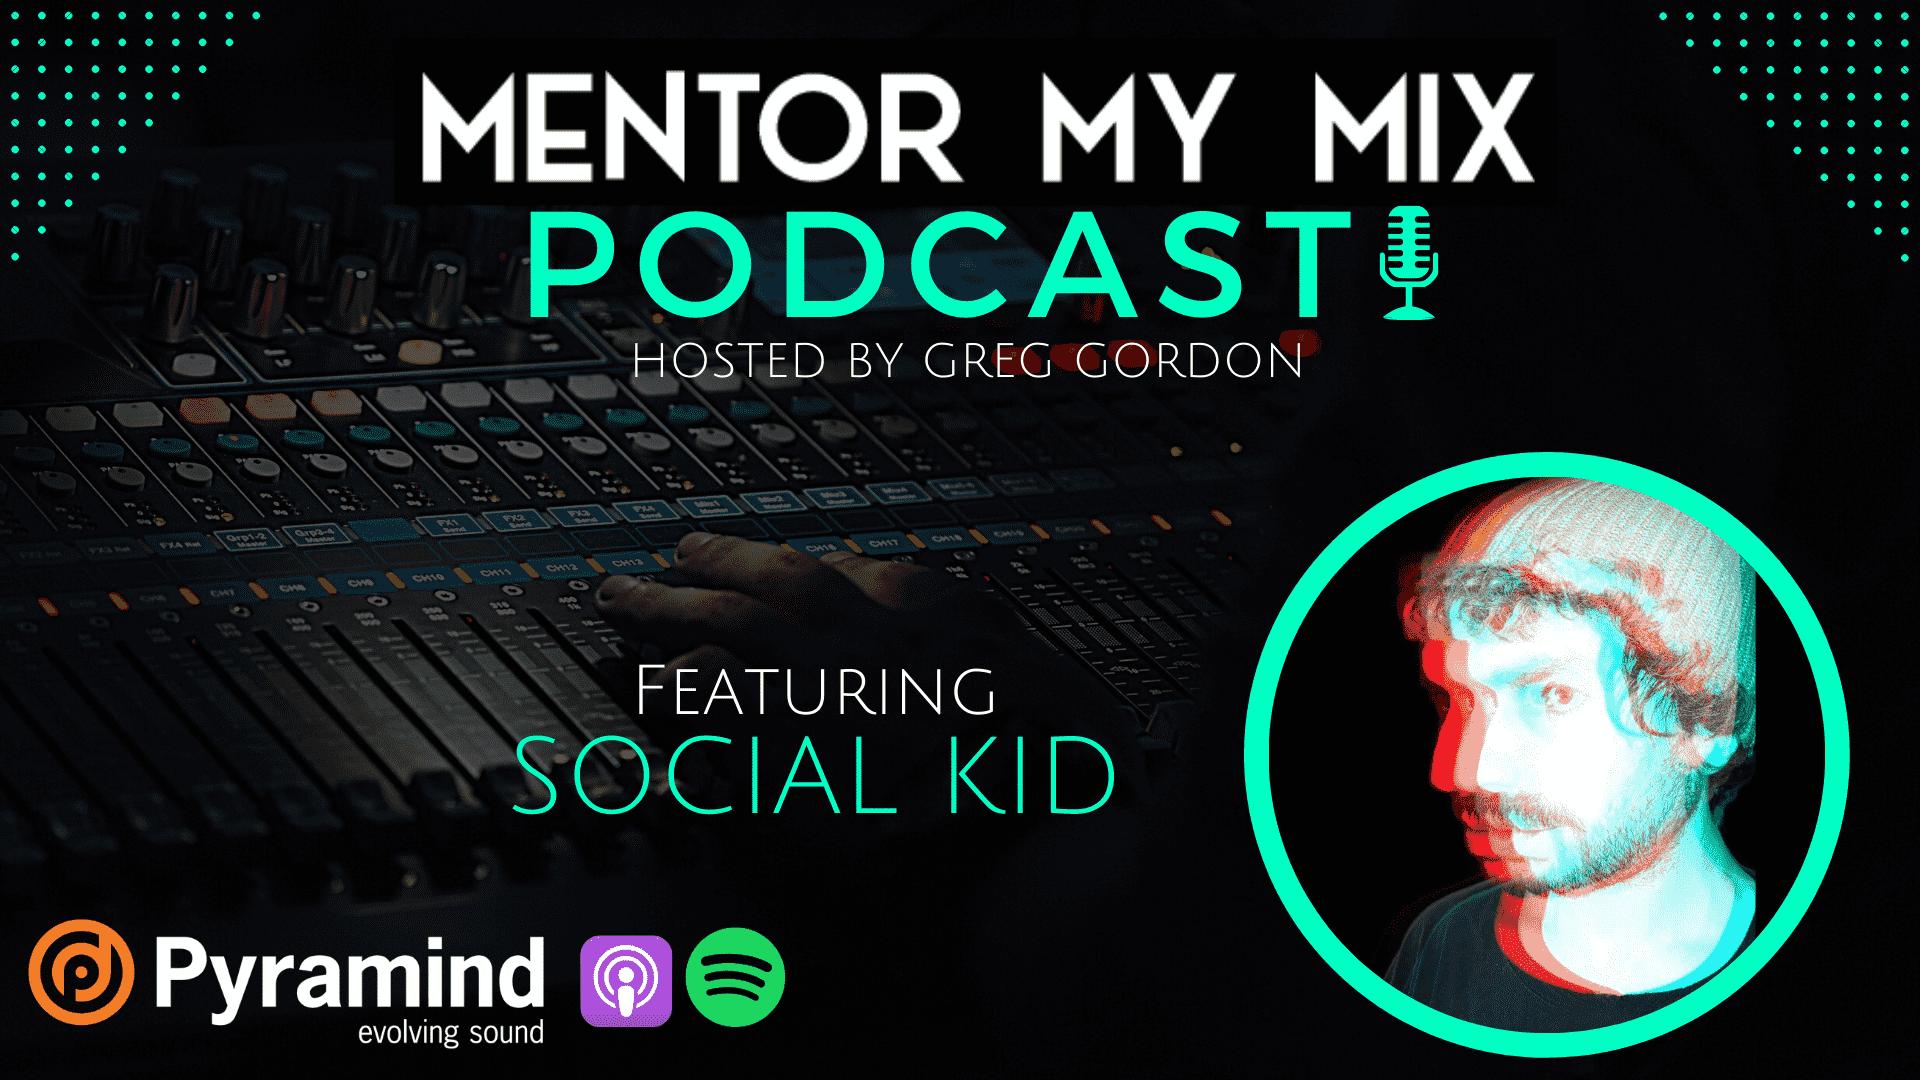 Mentor My Mix - SOCIAL KID ep. 009